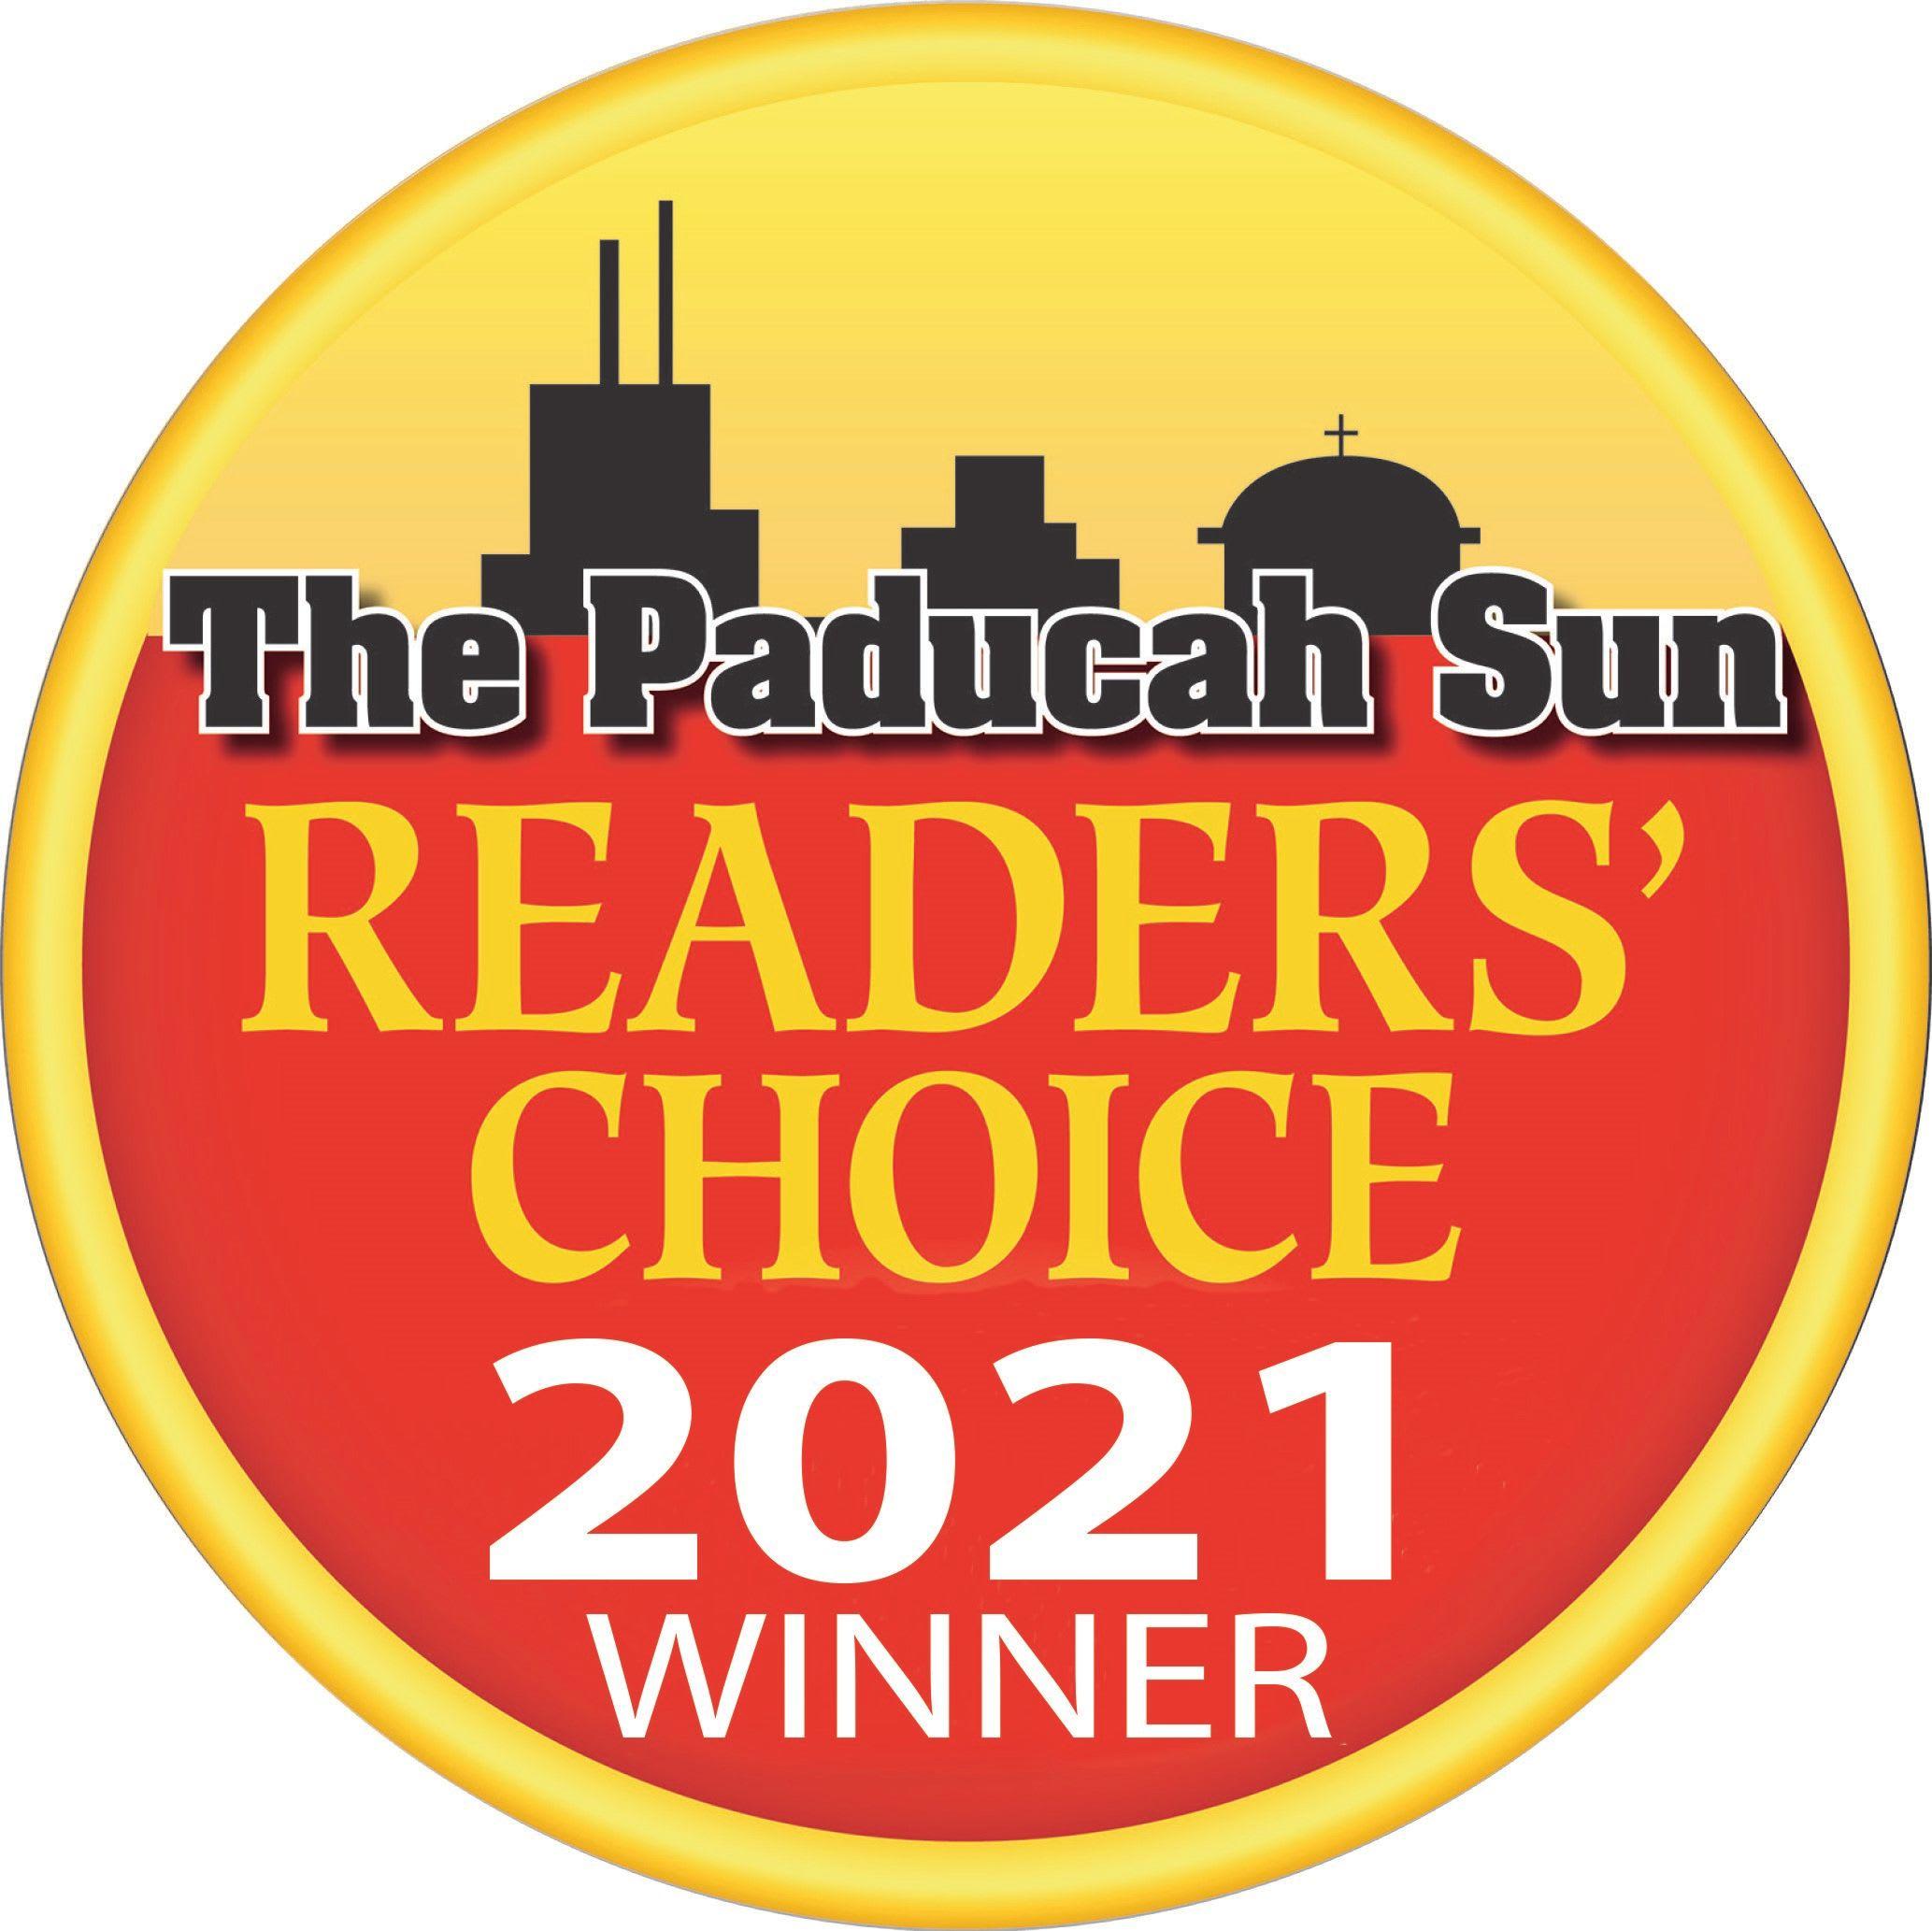 Reader's Choice Winner 2021